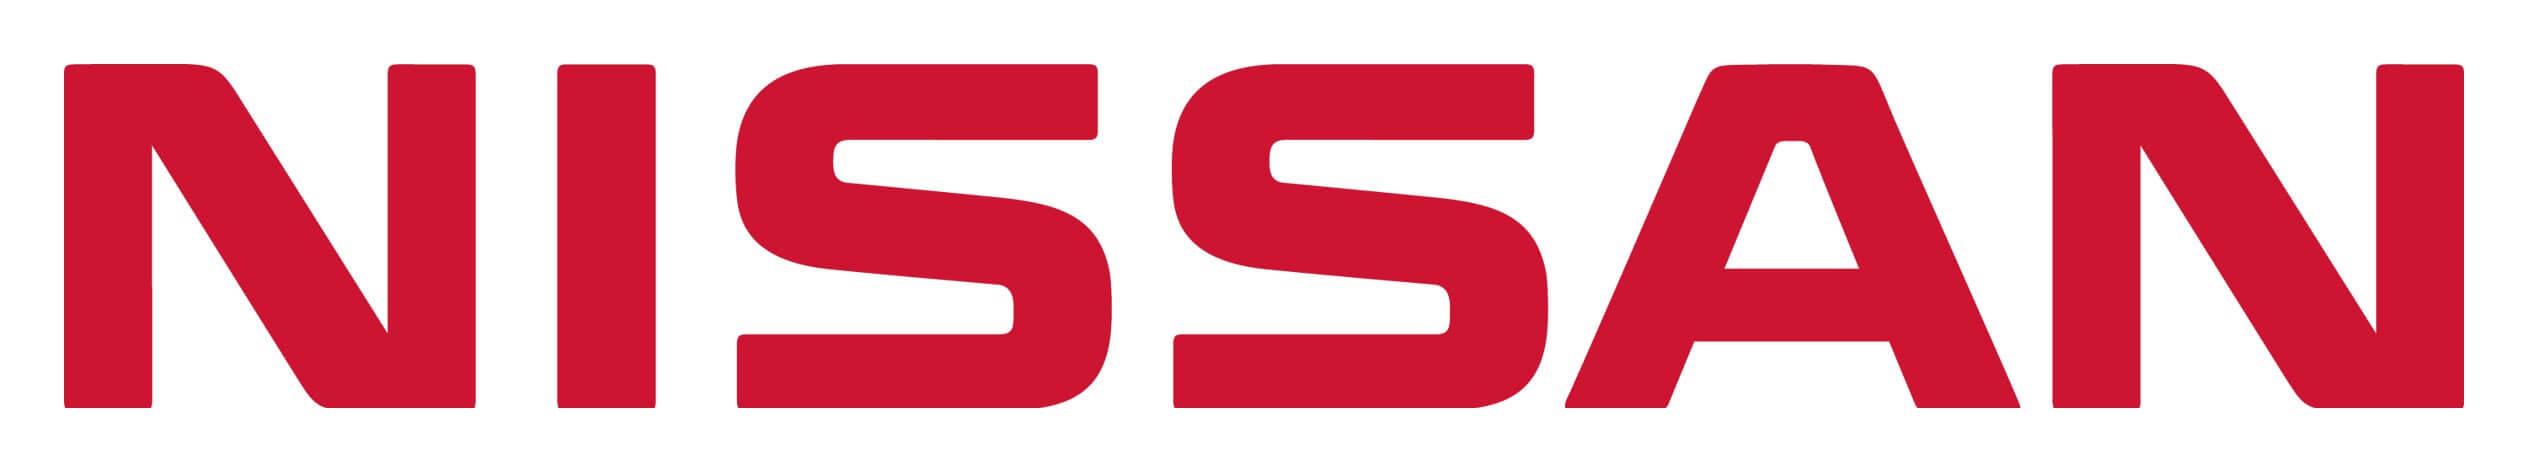 Nissan, logo